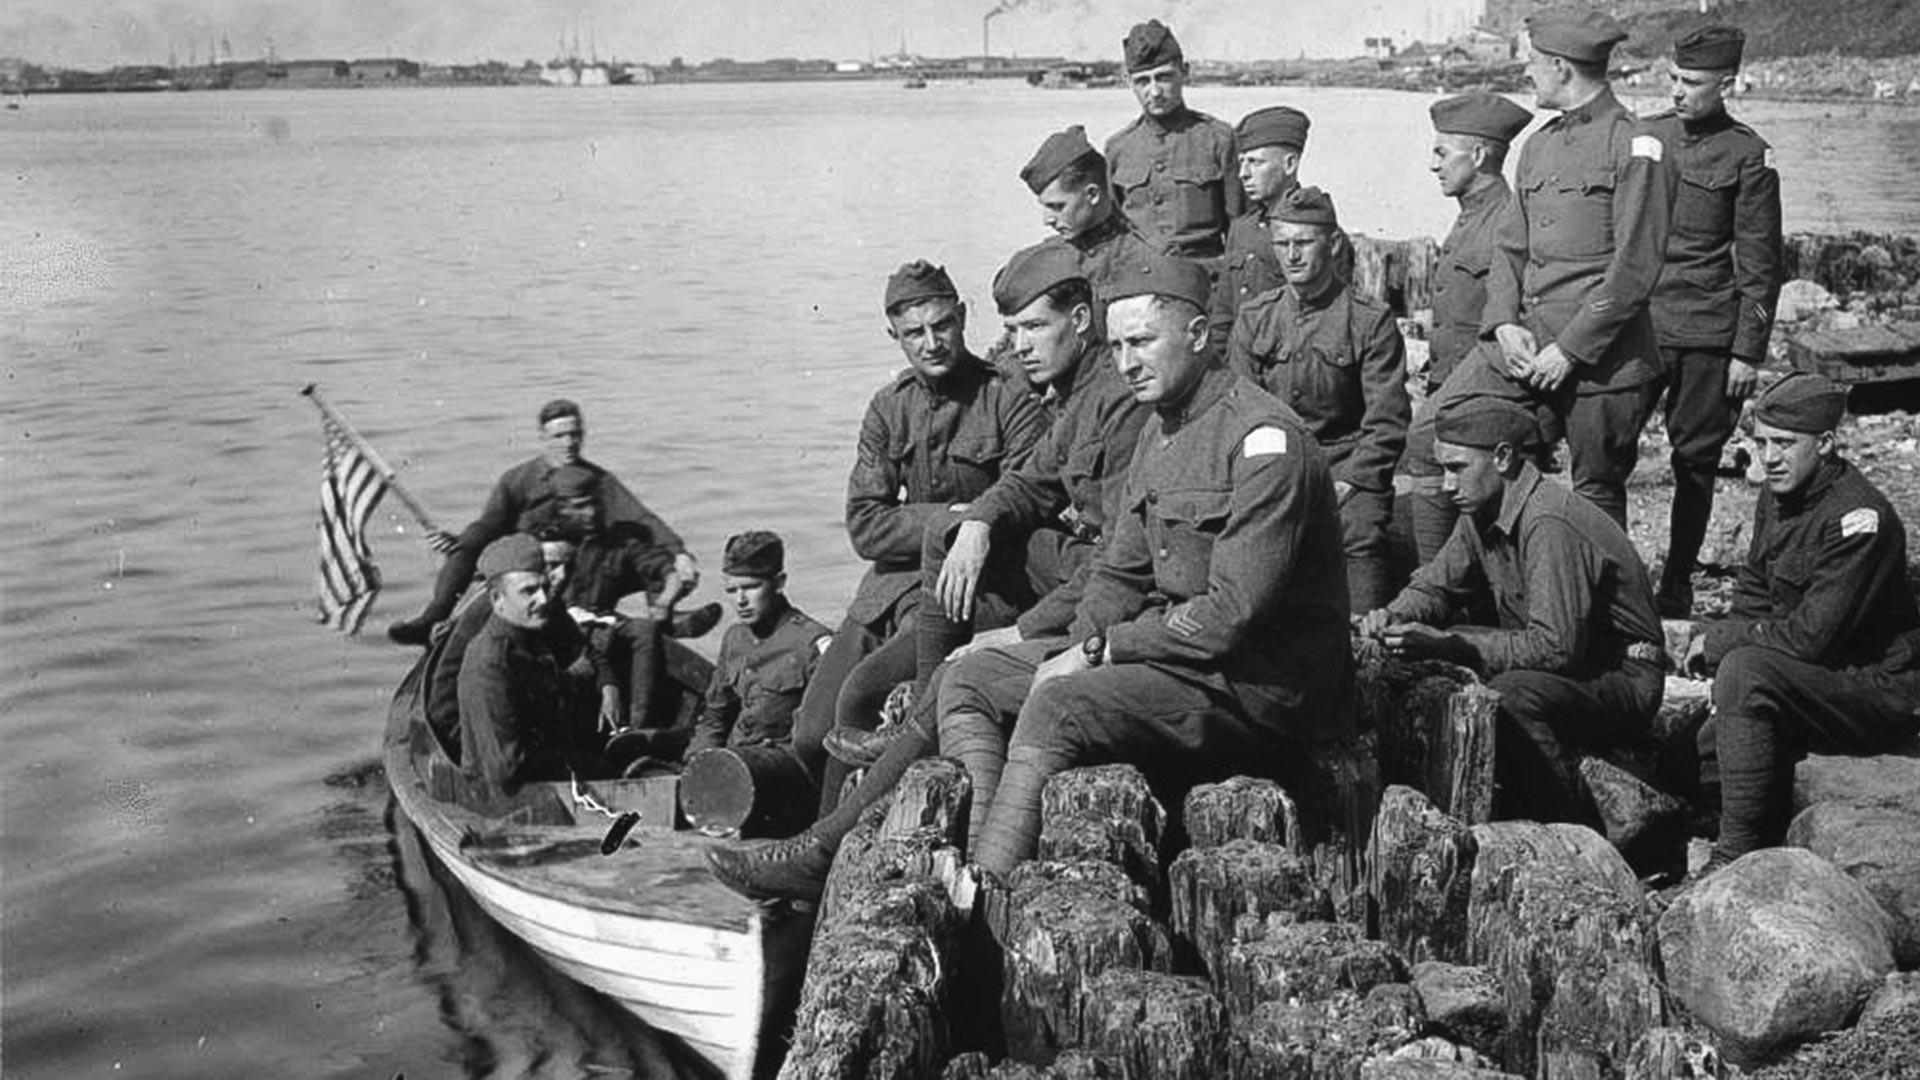 Amerikanische Soldaten in Russland, 1919.